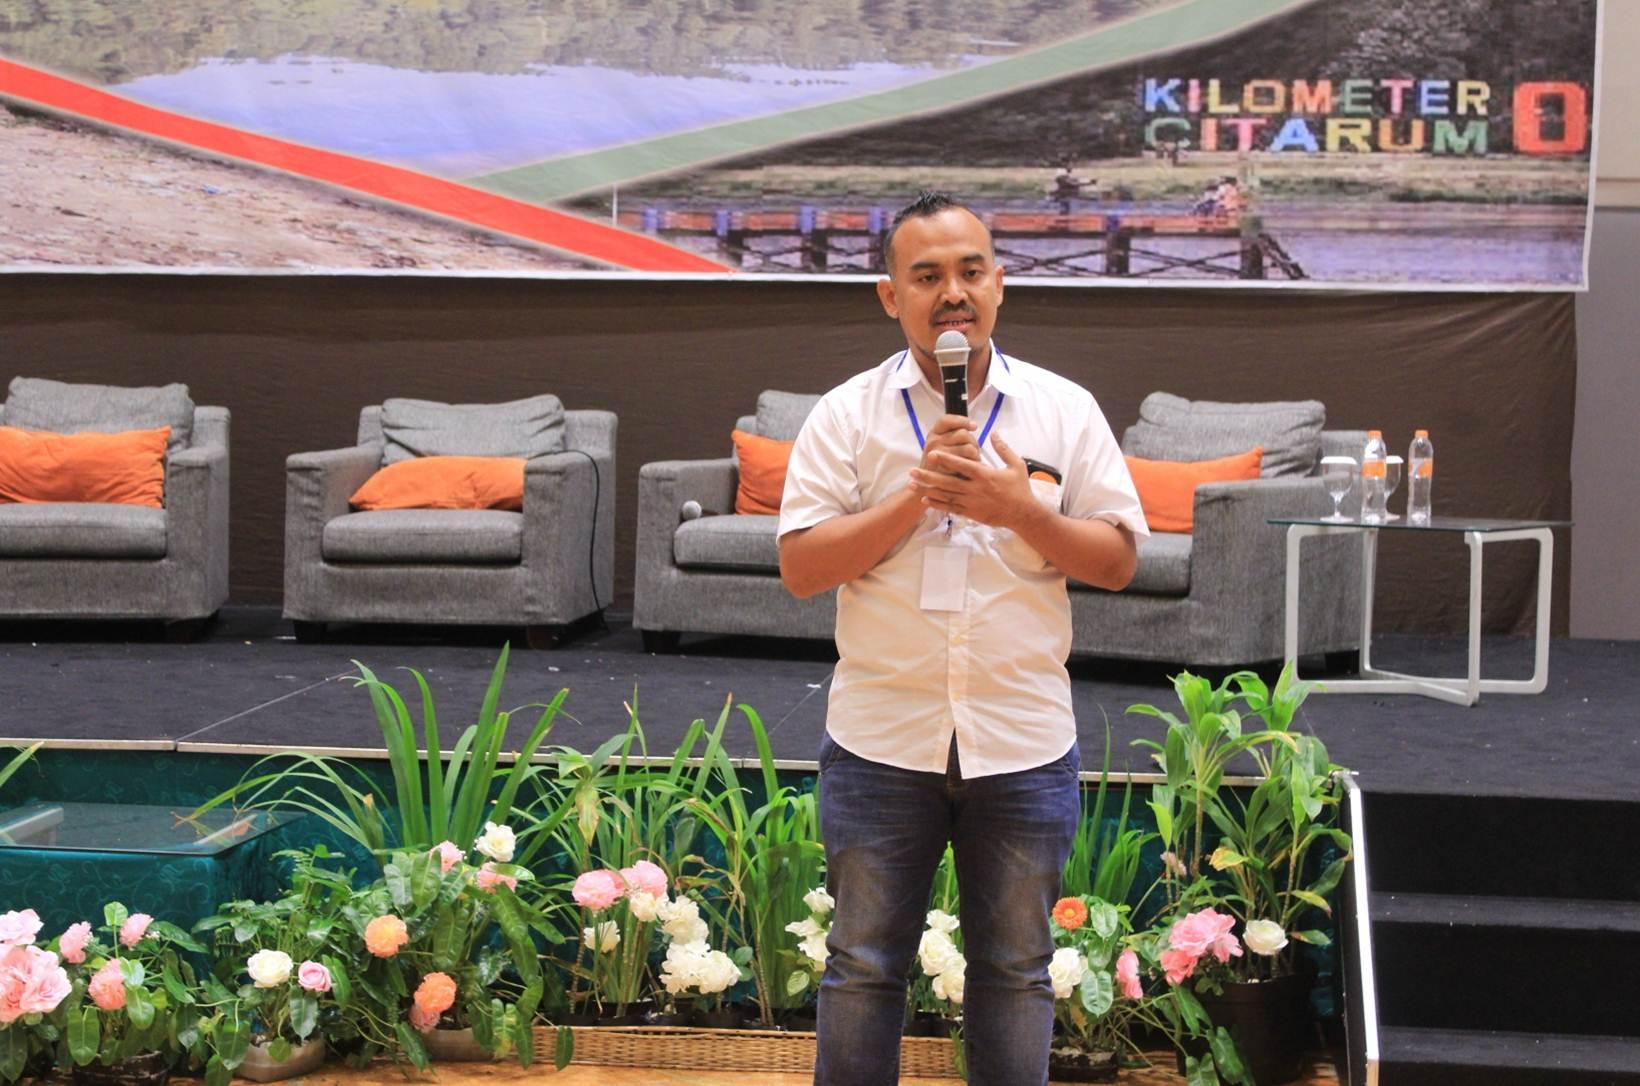 Wakil Rektor III Universitas Esa Unggul Ari Pambudi, S.Kom.,M.Kom